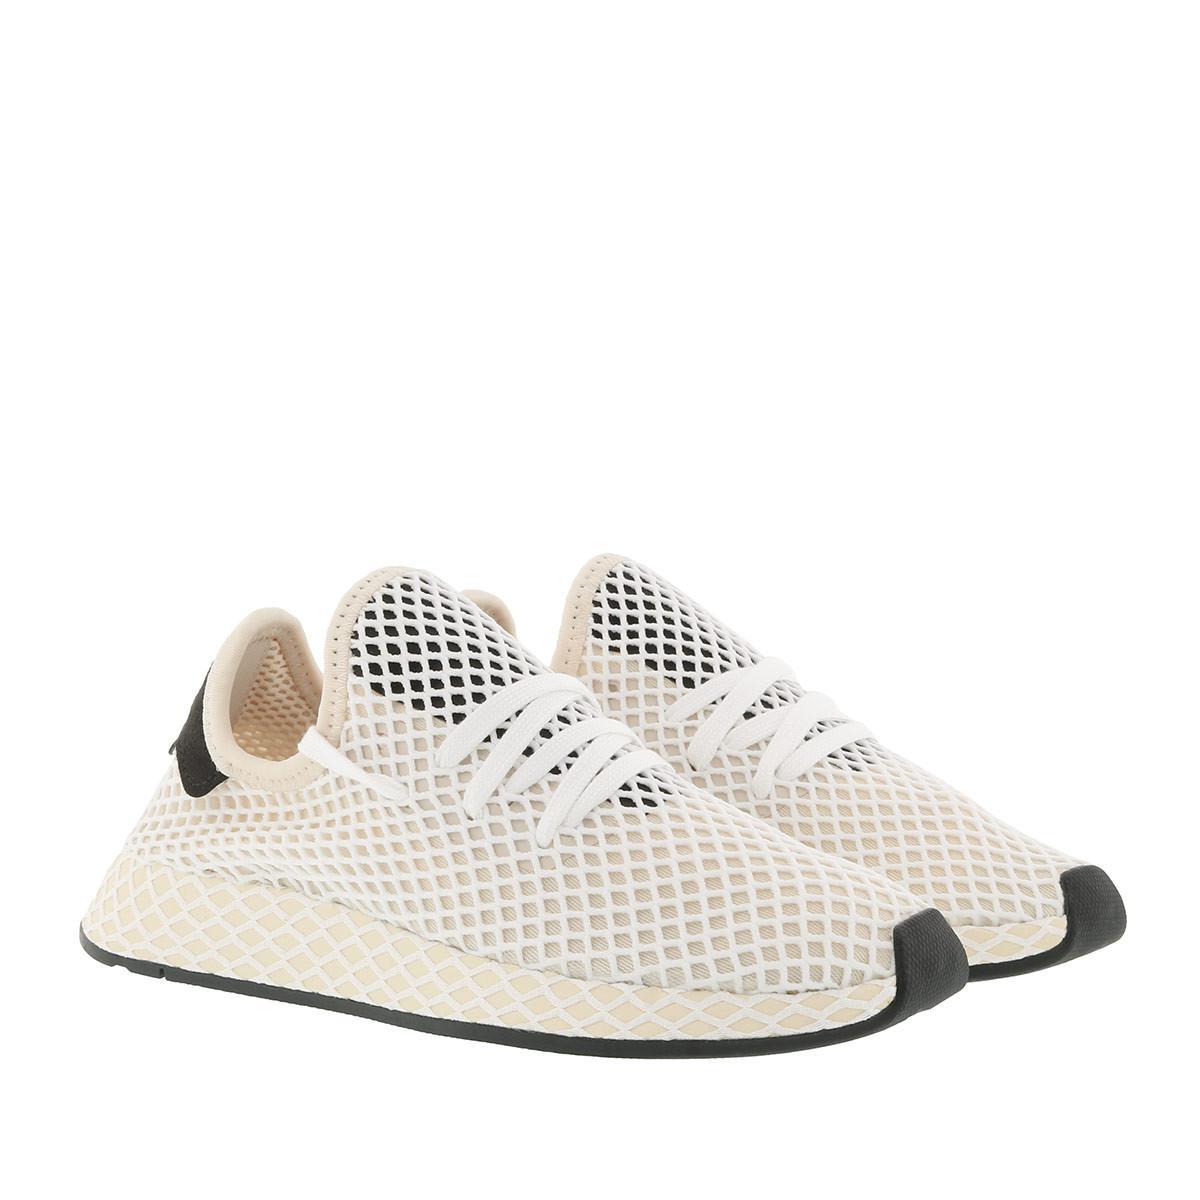 exquisite style beauty the best attitude Deerupt Runner W Sneaker Linen/linen/ecrtin